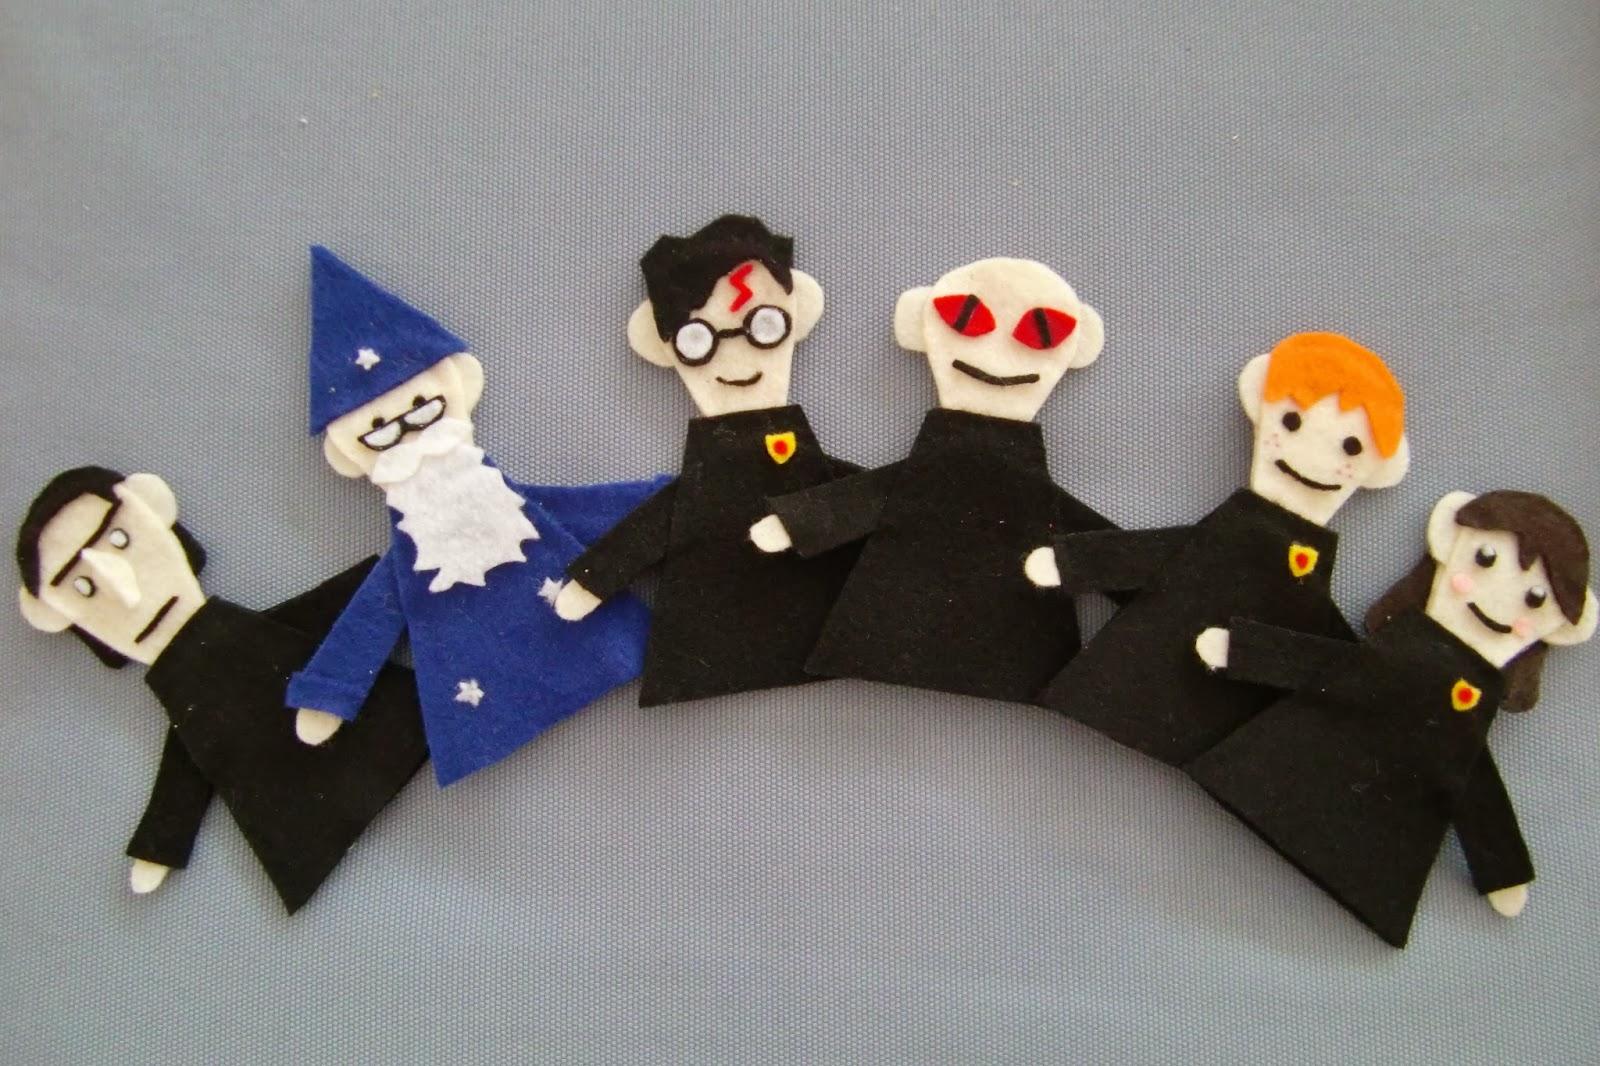 Potter puppet pals naked